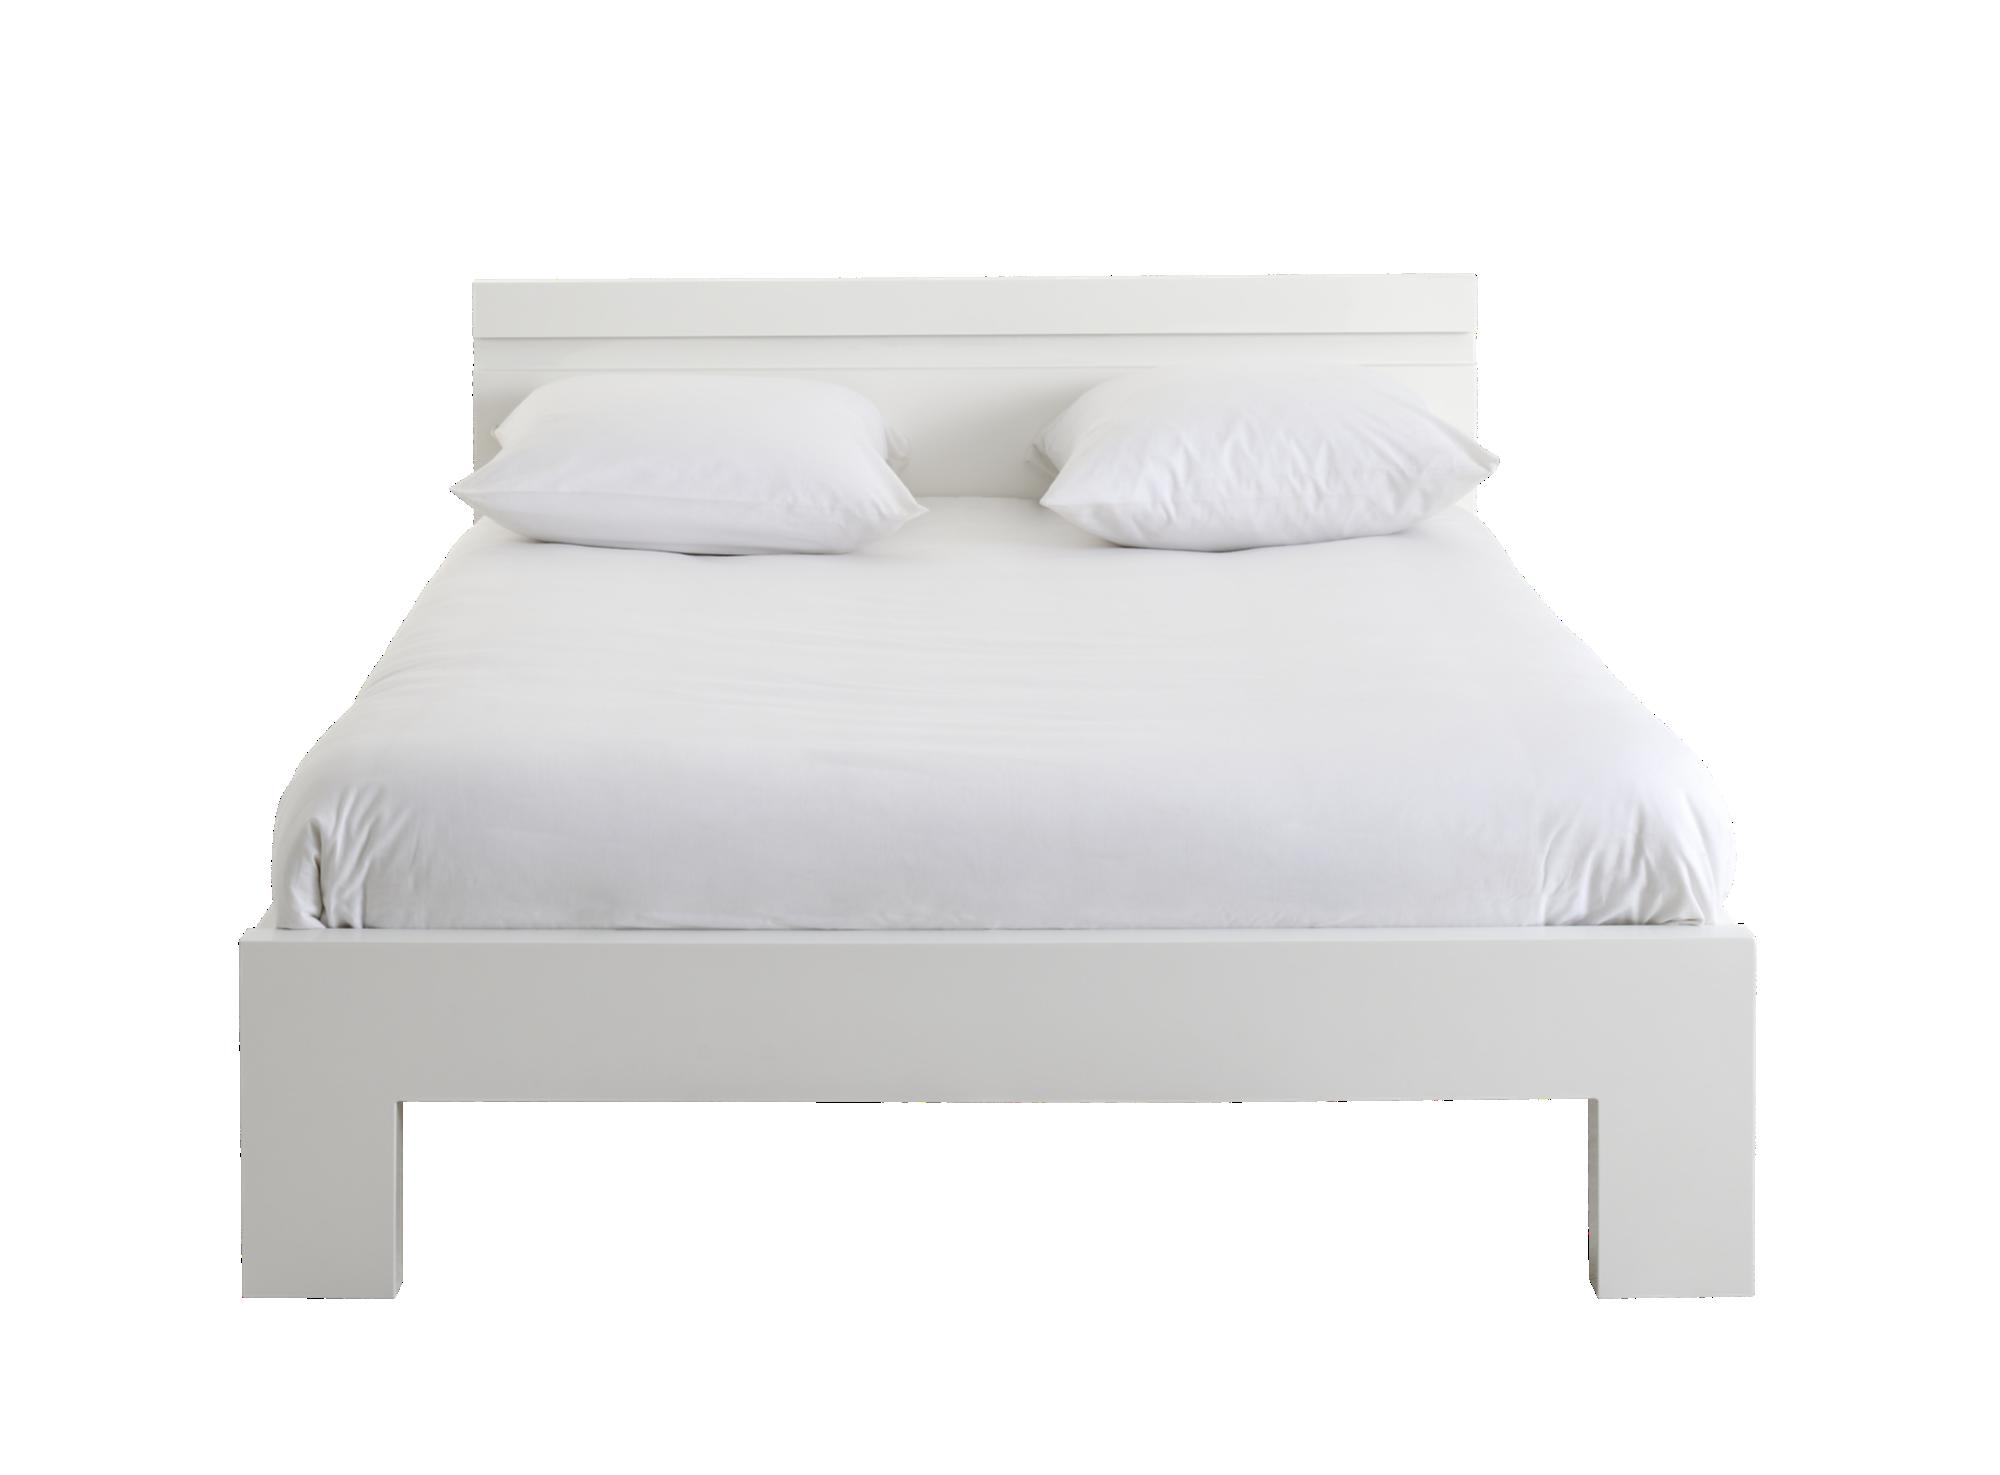 lit 140x190 cm avec leds blanc brillant lit adulte lit literie fly. Black Bedroom Furniture Sets. Home Design Ideas